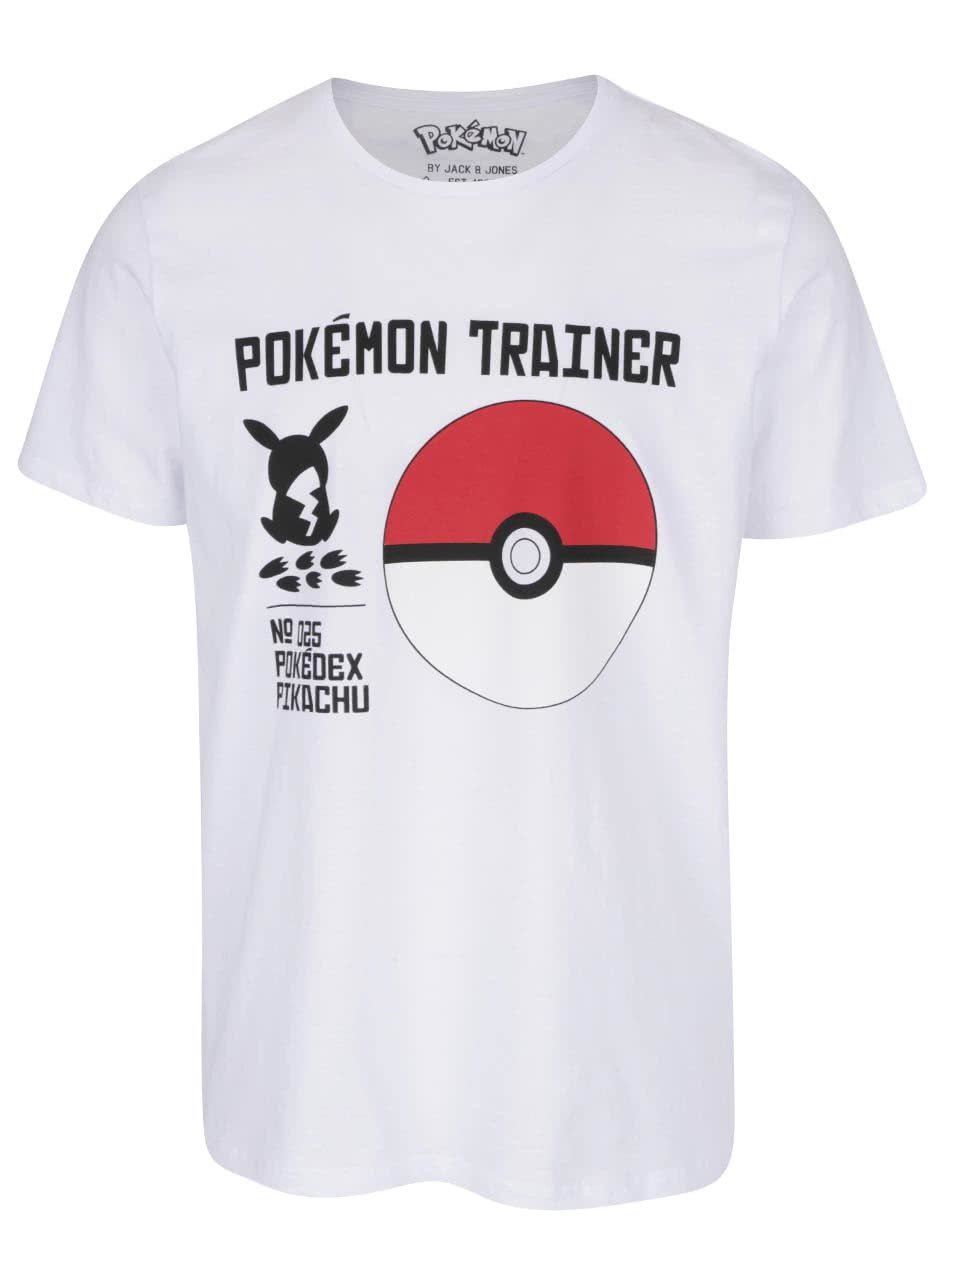 Bílé triko s potiskem Jack & Jones Pokemon